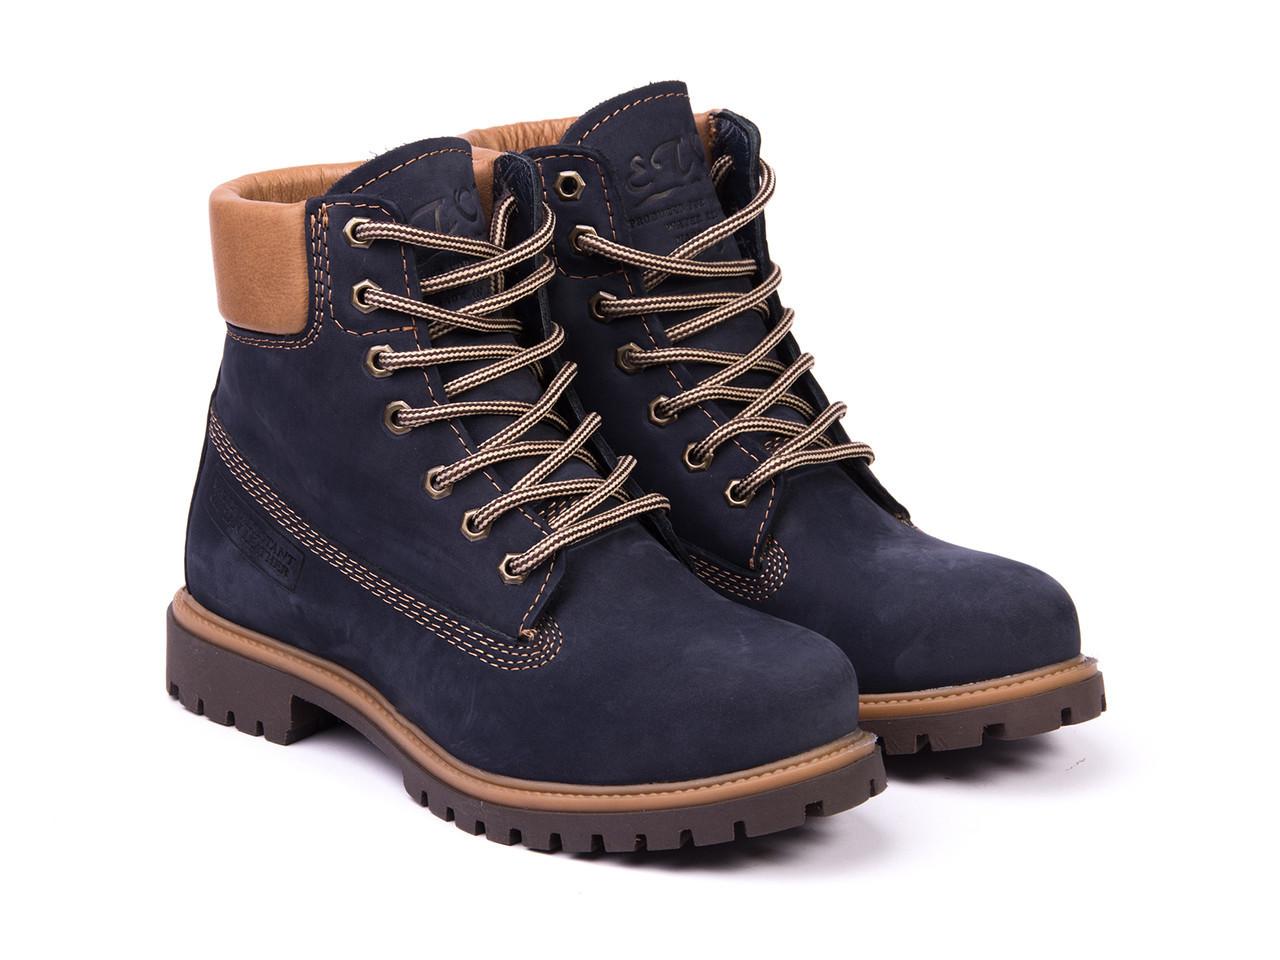 Ботинки Etor 9916-2298 44 синие